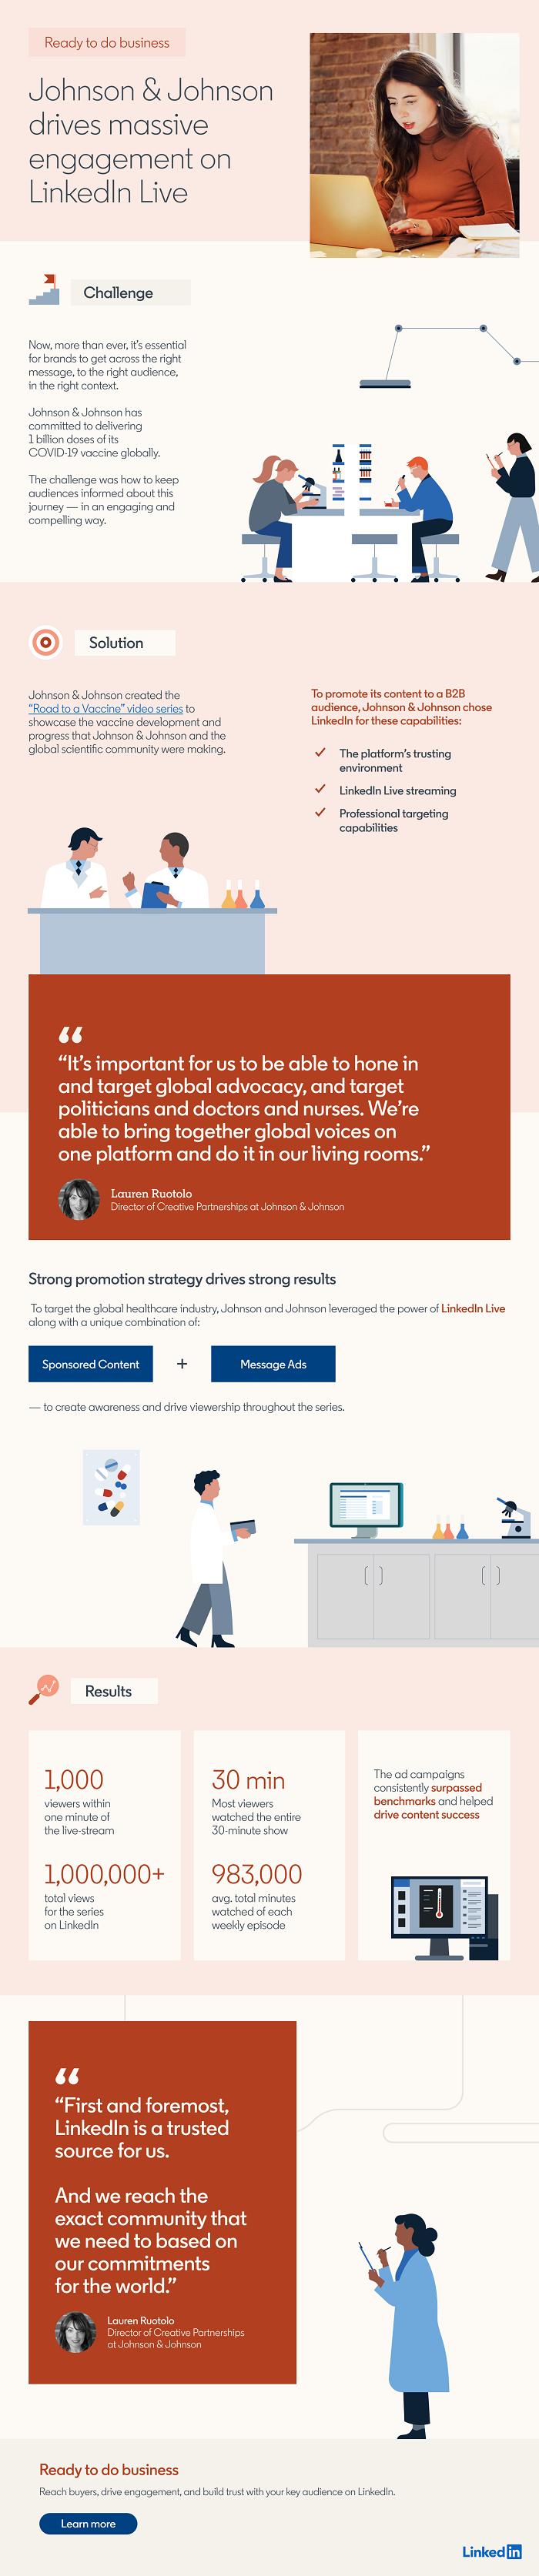 LinkedIn case study - Johnson & Johnson